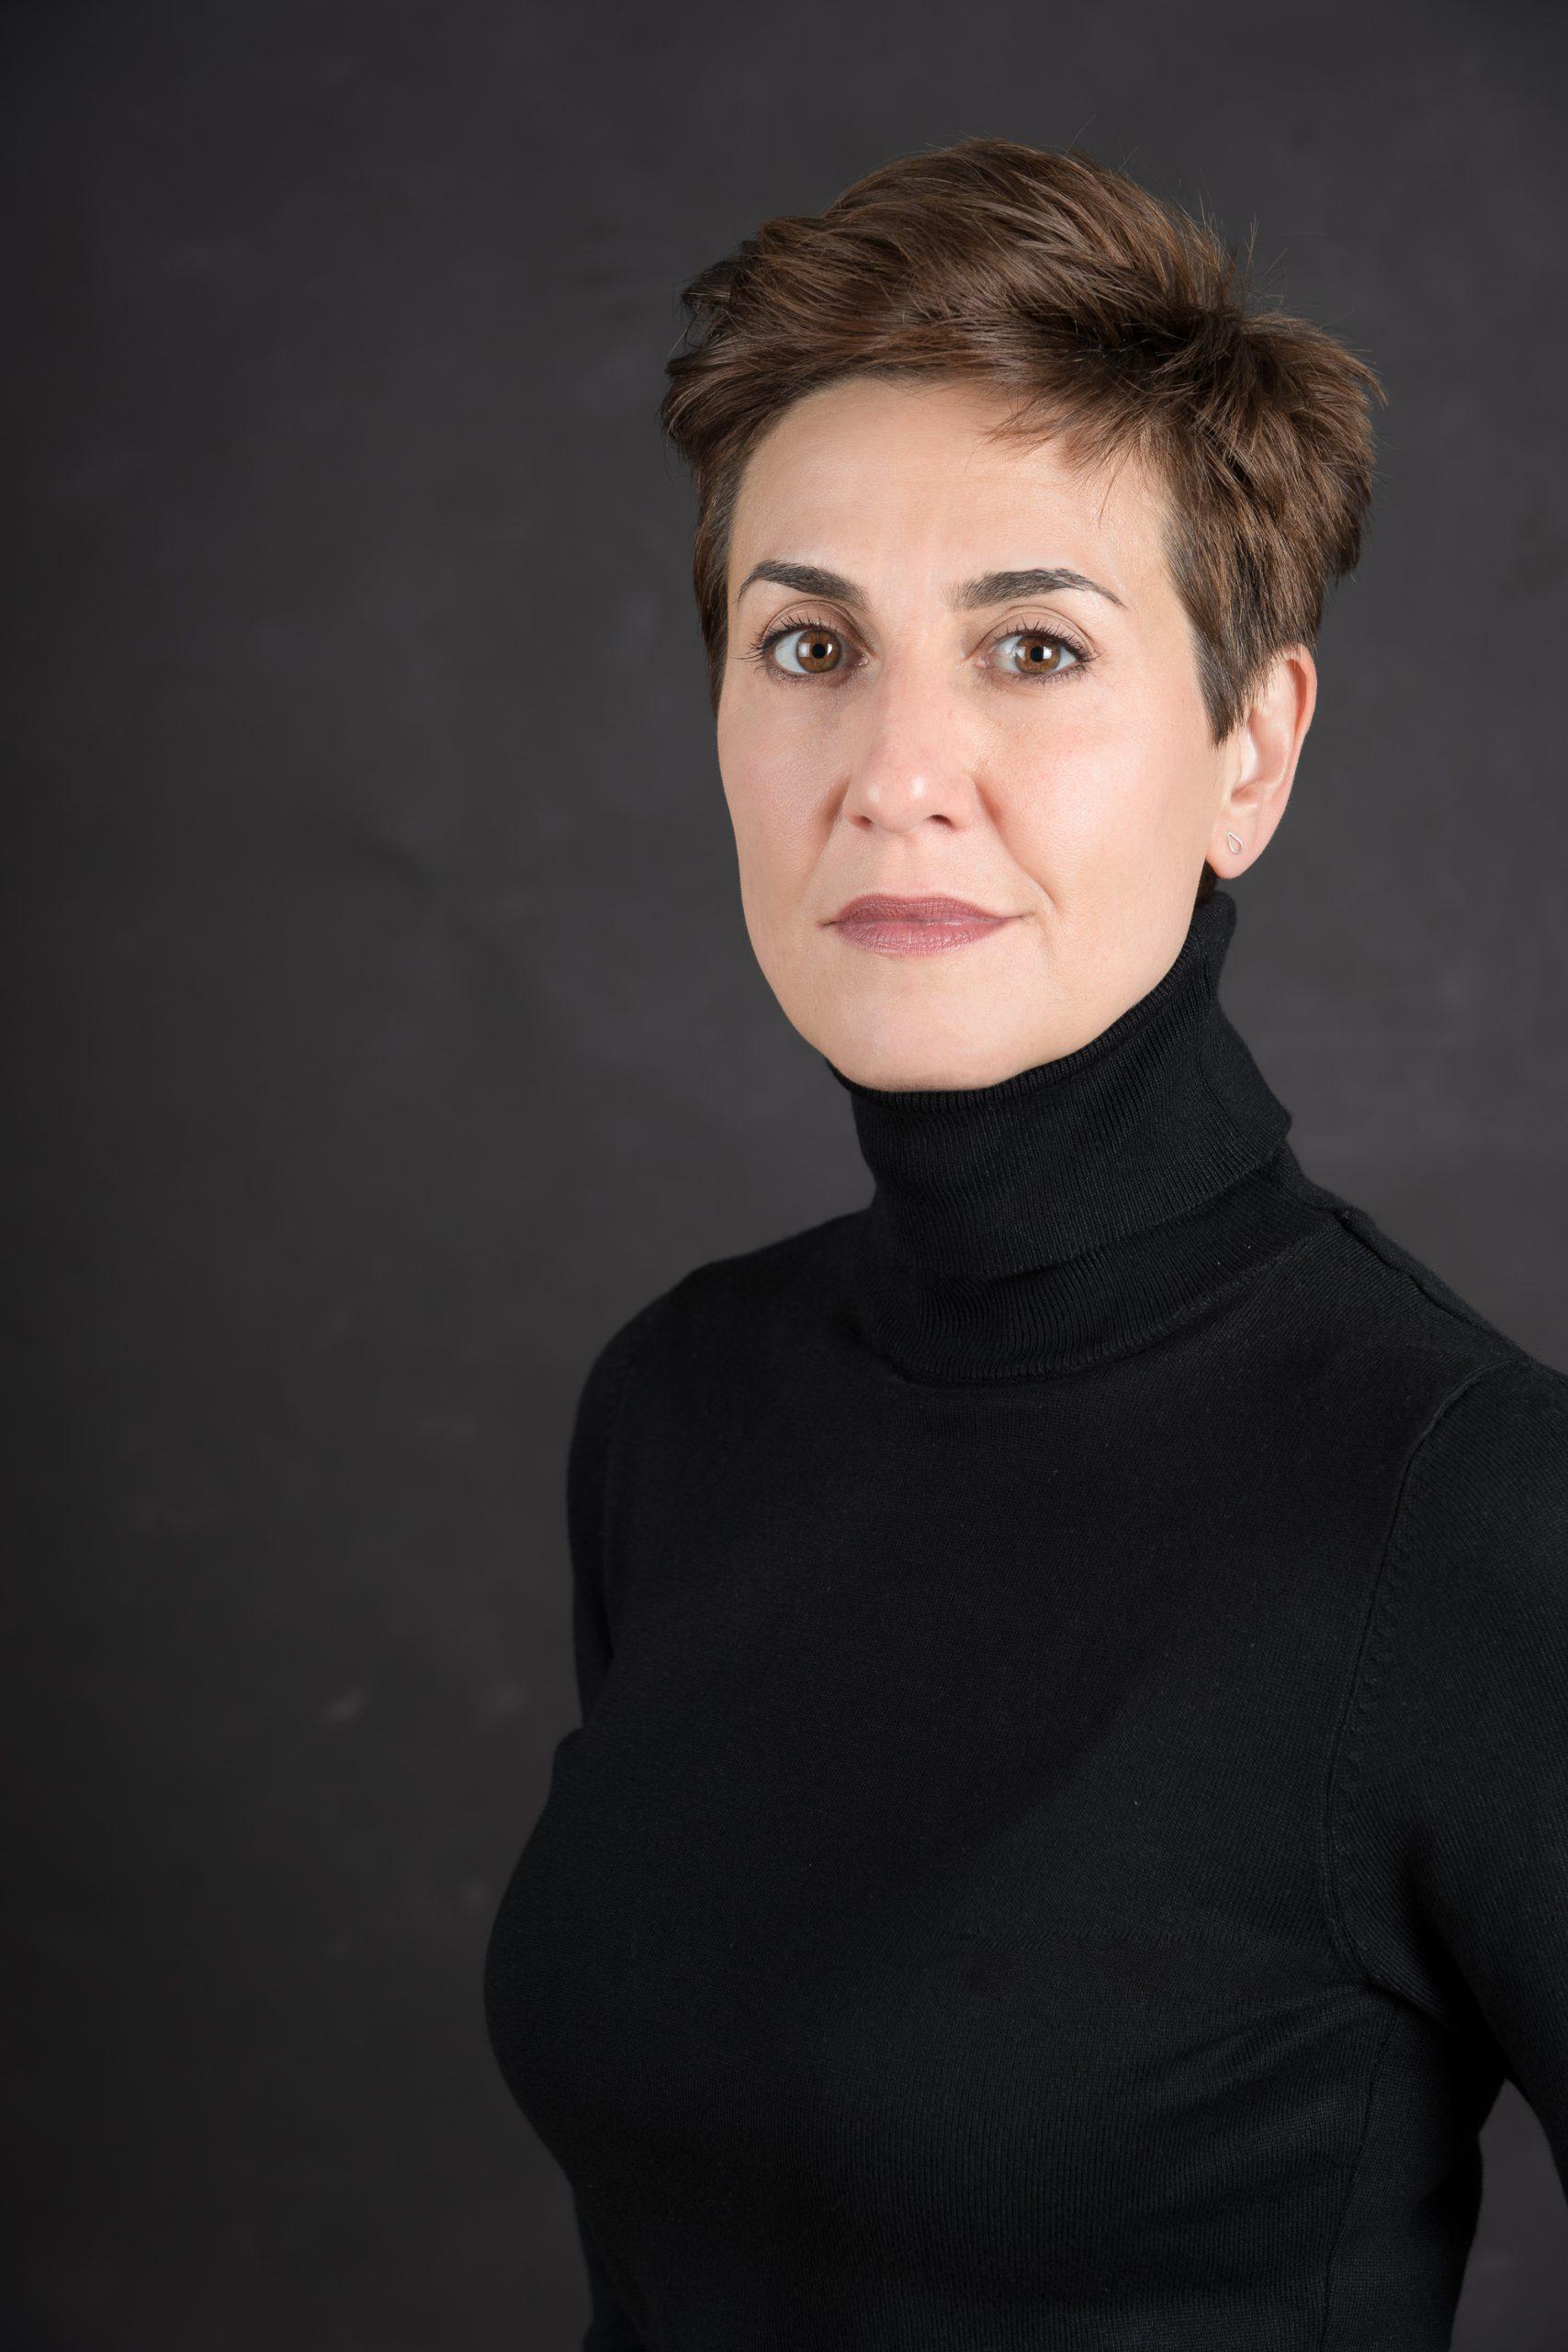 Stephanie Figueira